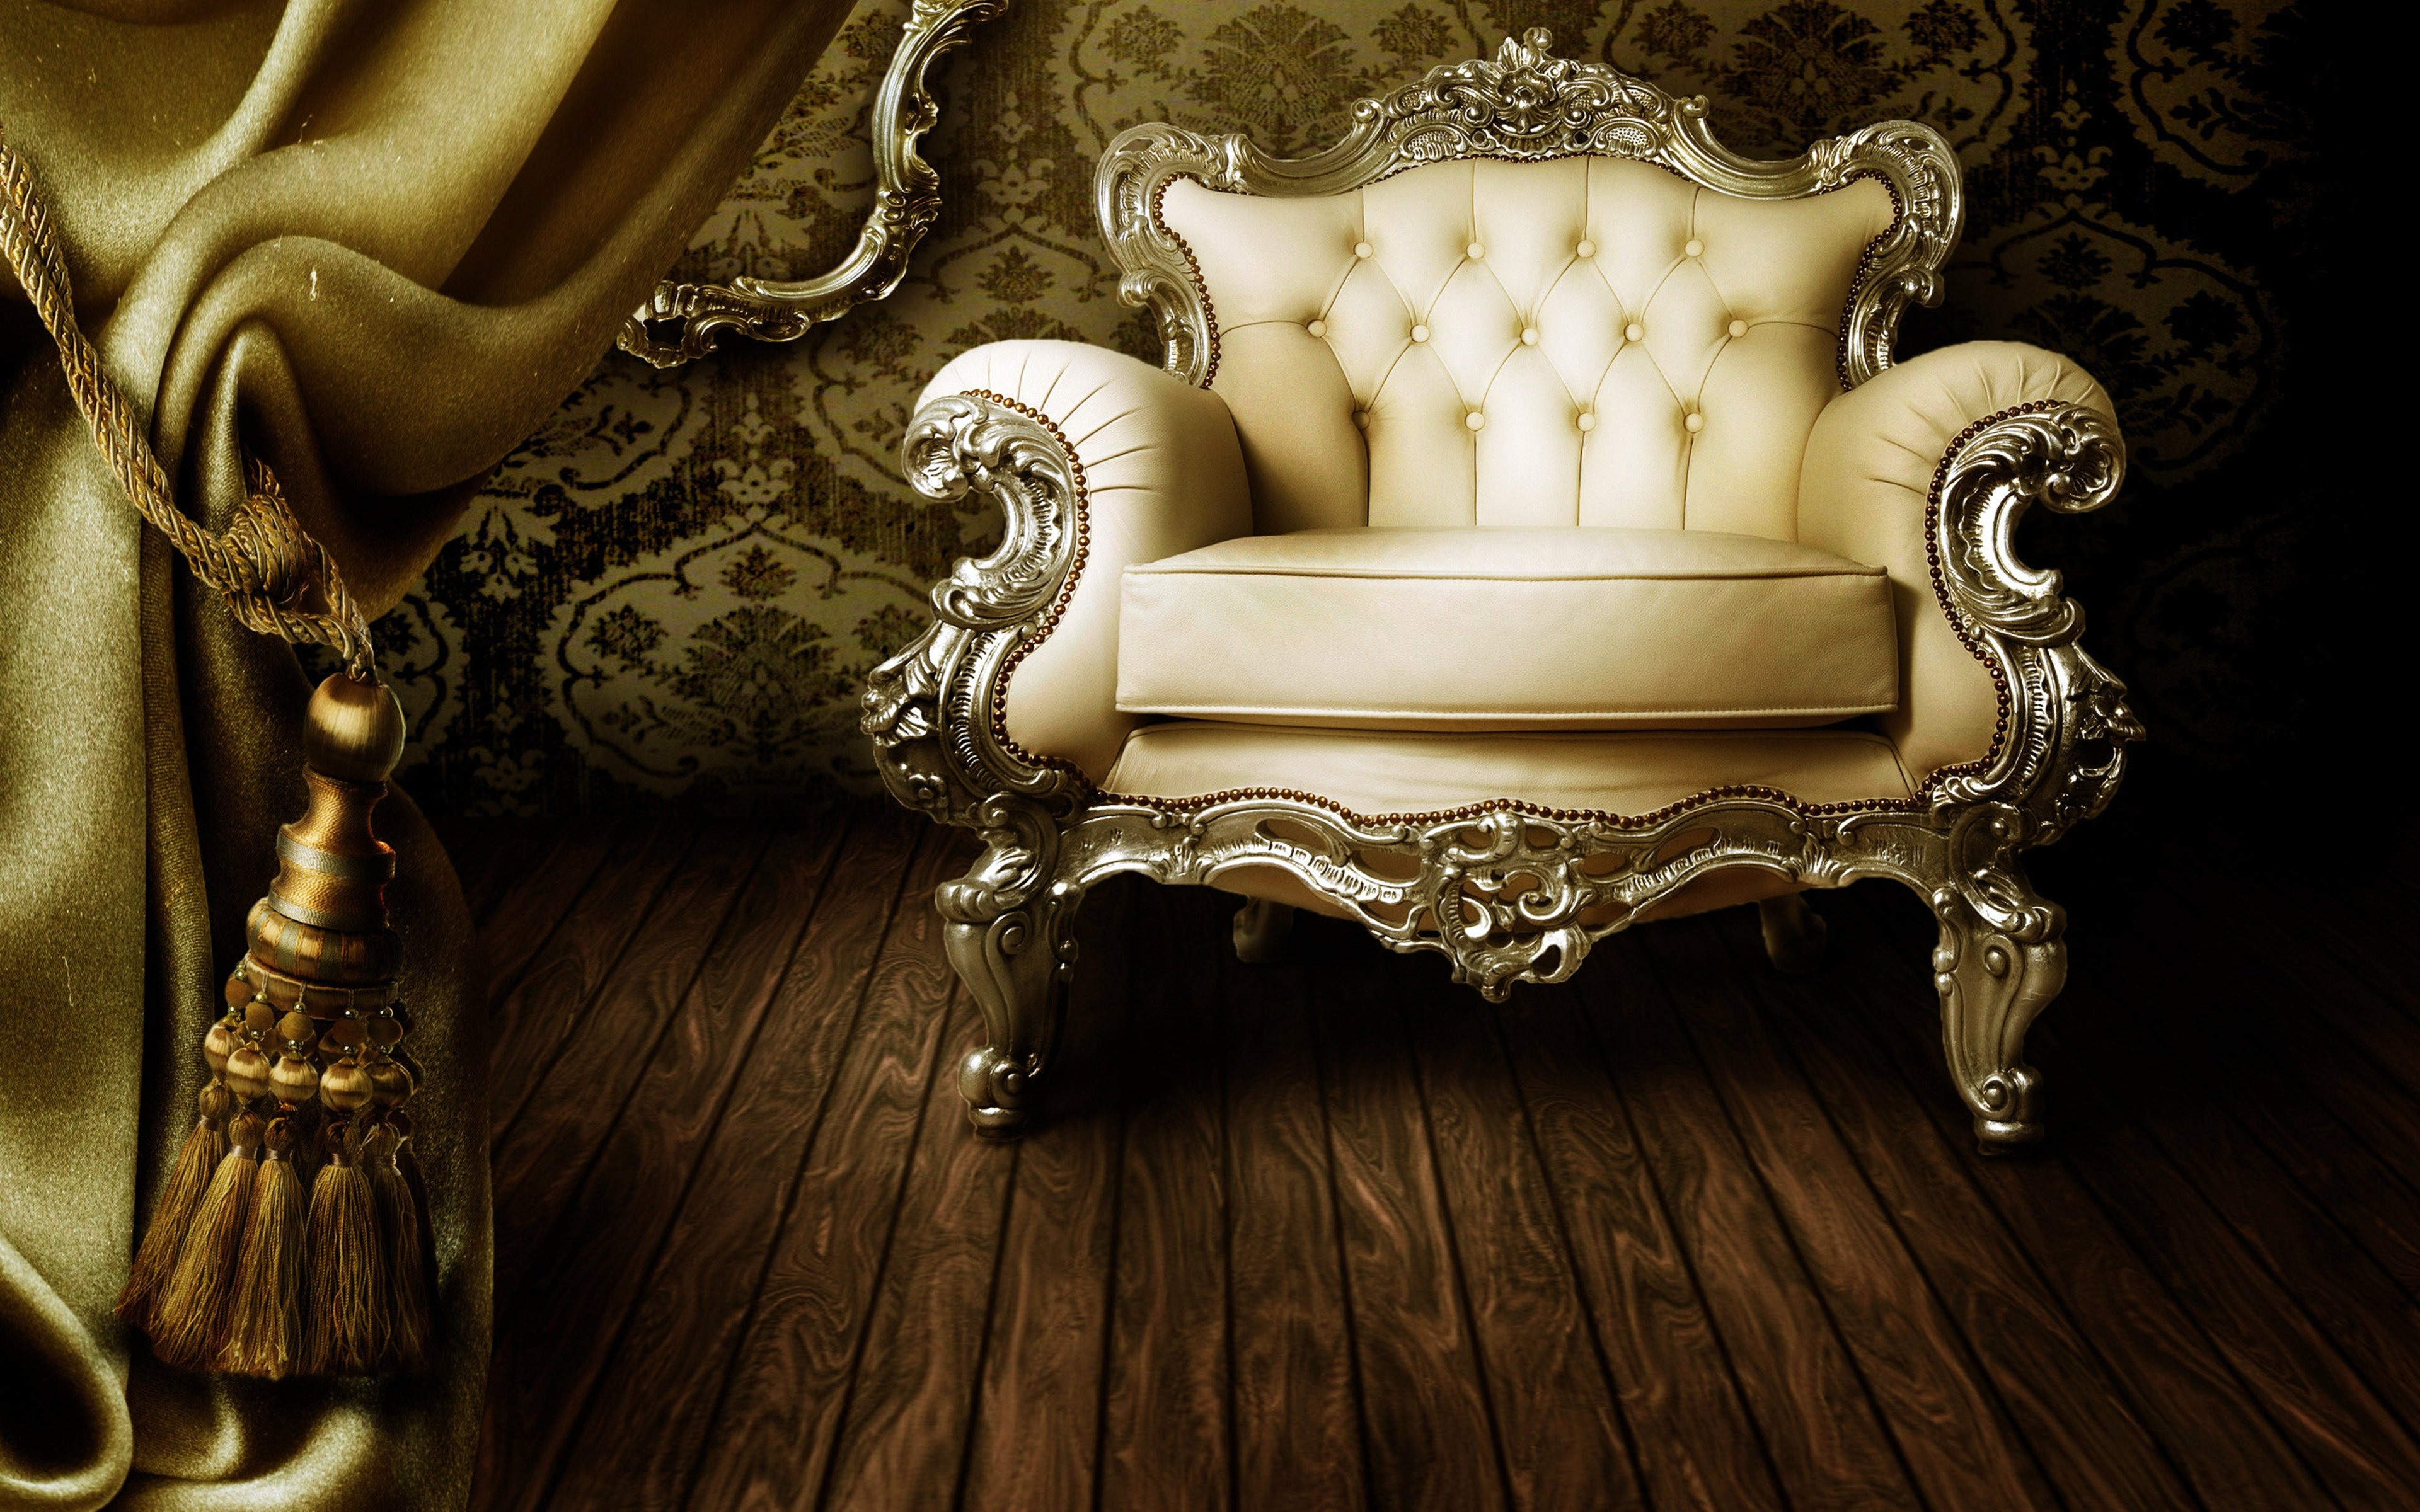 Furniture Wallpapers Hd For Desktop Backgrounds